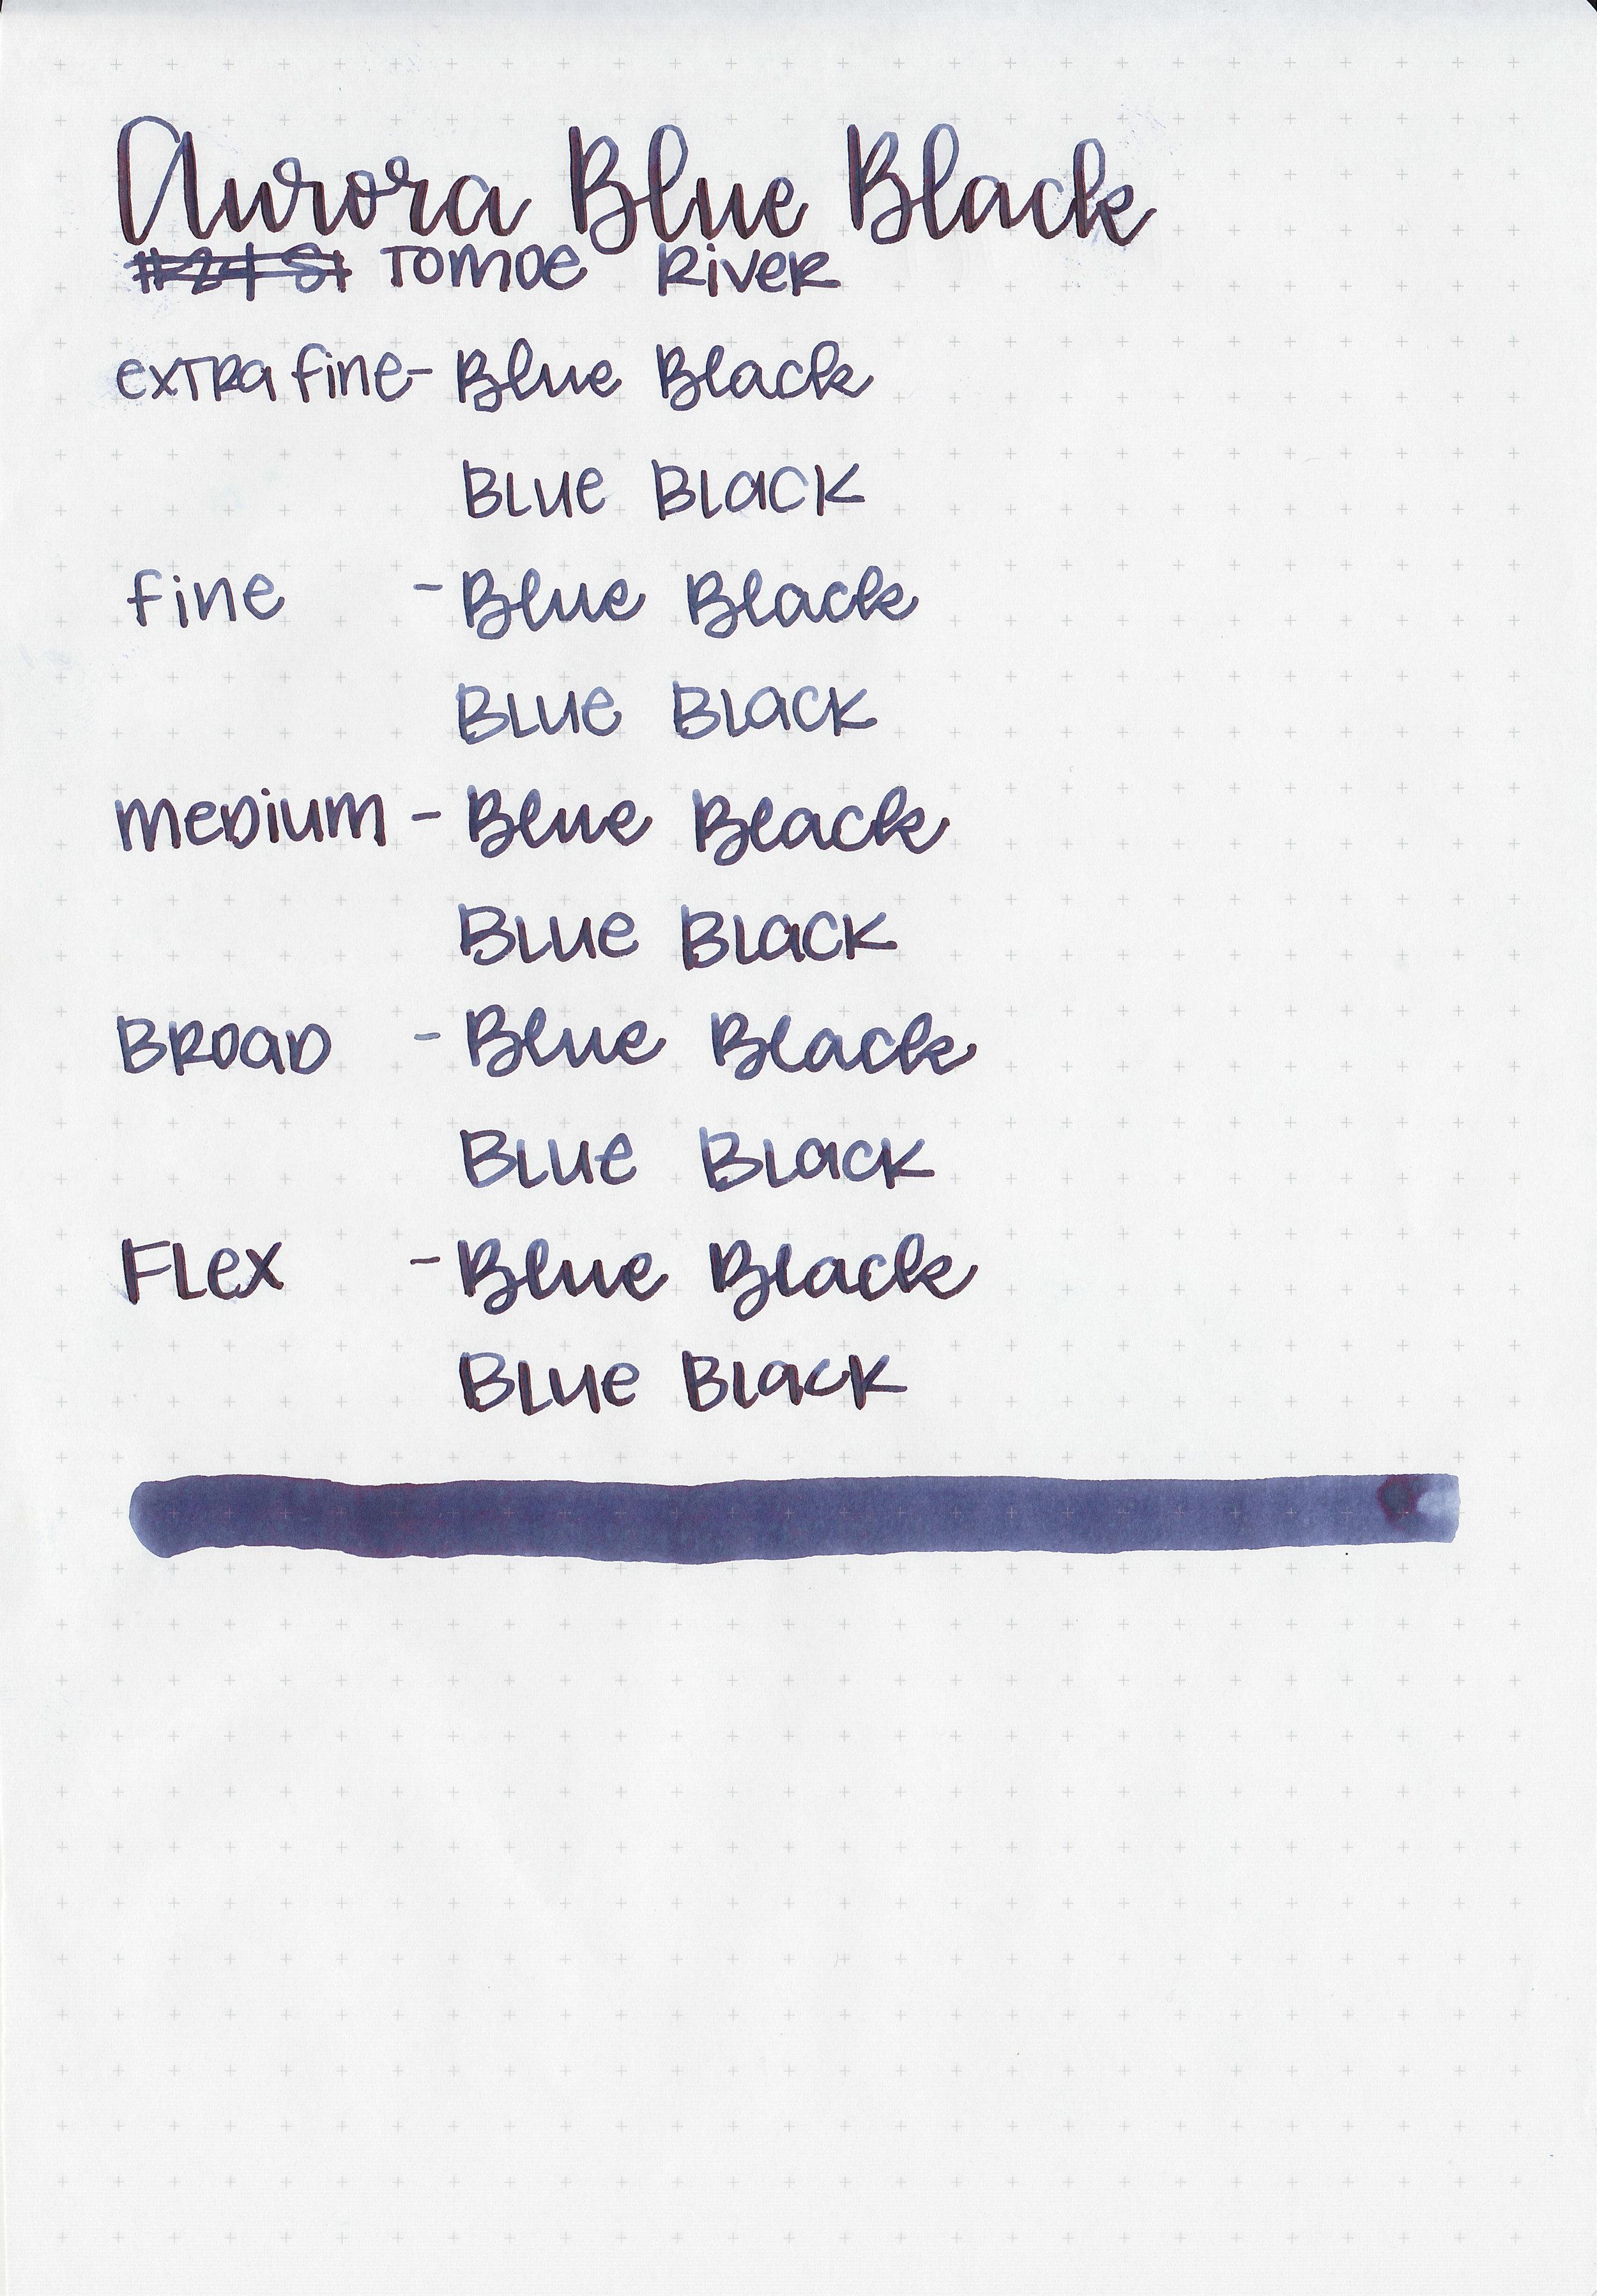 ar-blue-black-7.jpg